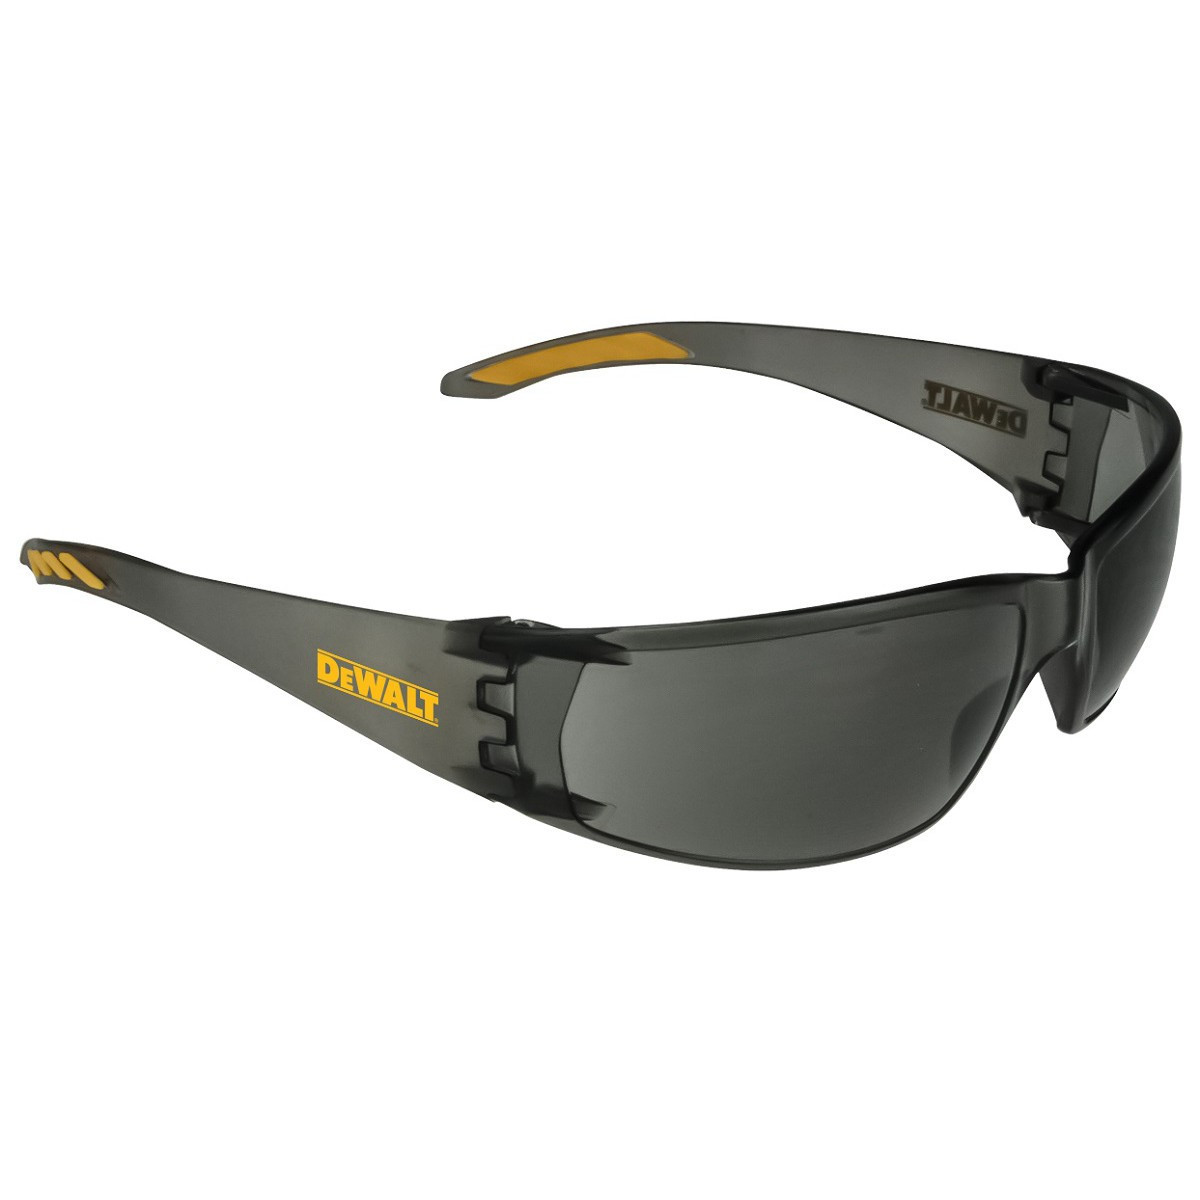 90d4383b483 DeWalt DPG103-2D Rotex Safety Glasses - Smoke Frame - Smoke Lens. Price    3.50. Image 1